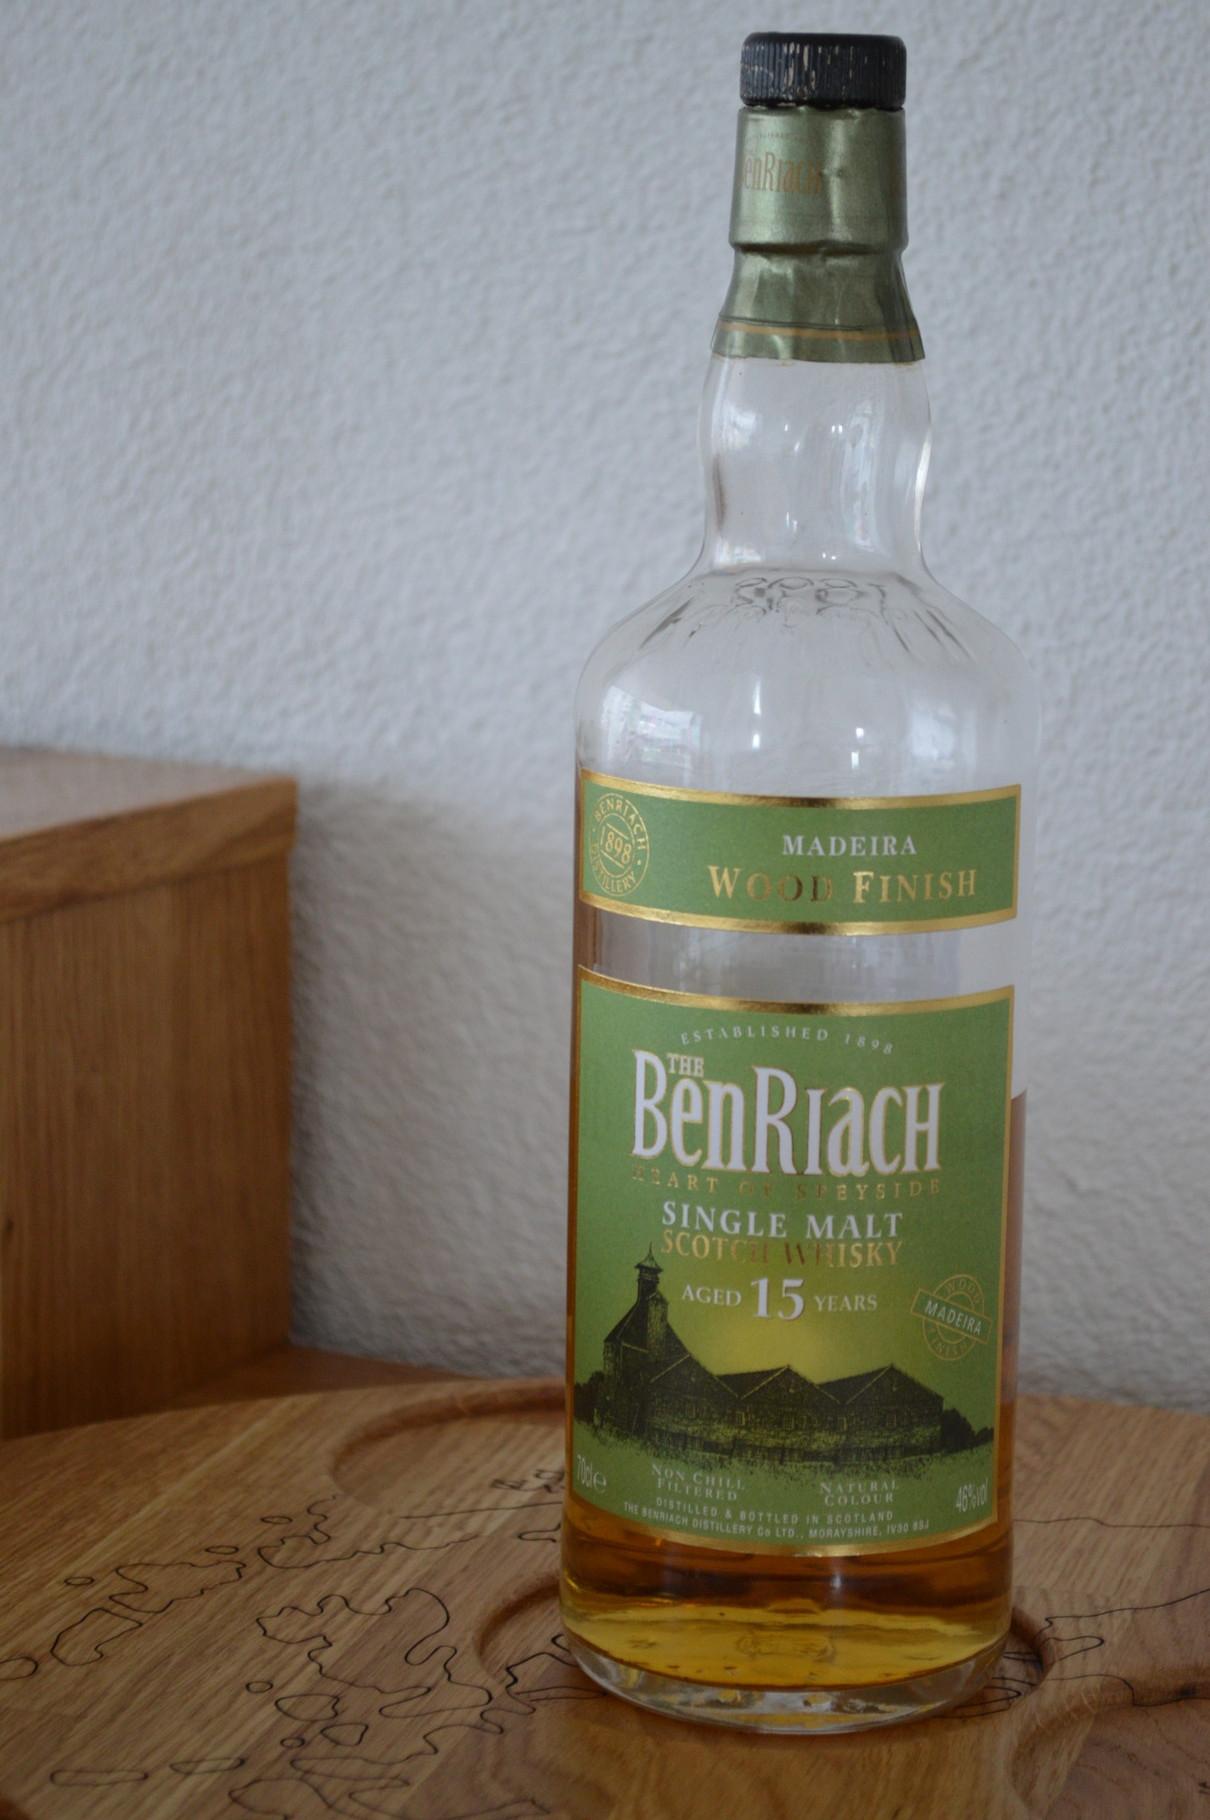 SPEYSIDE - BenRiach* - Aged: 15 years - Bottler: Original - 70cl - 46% - Madeira Finish